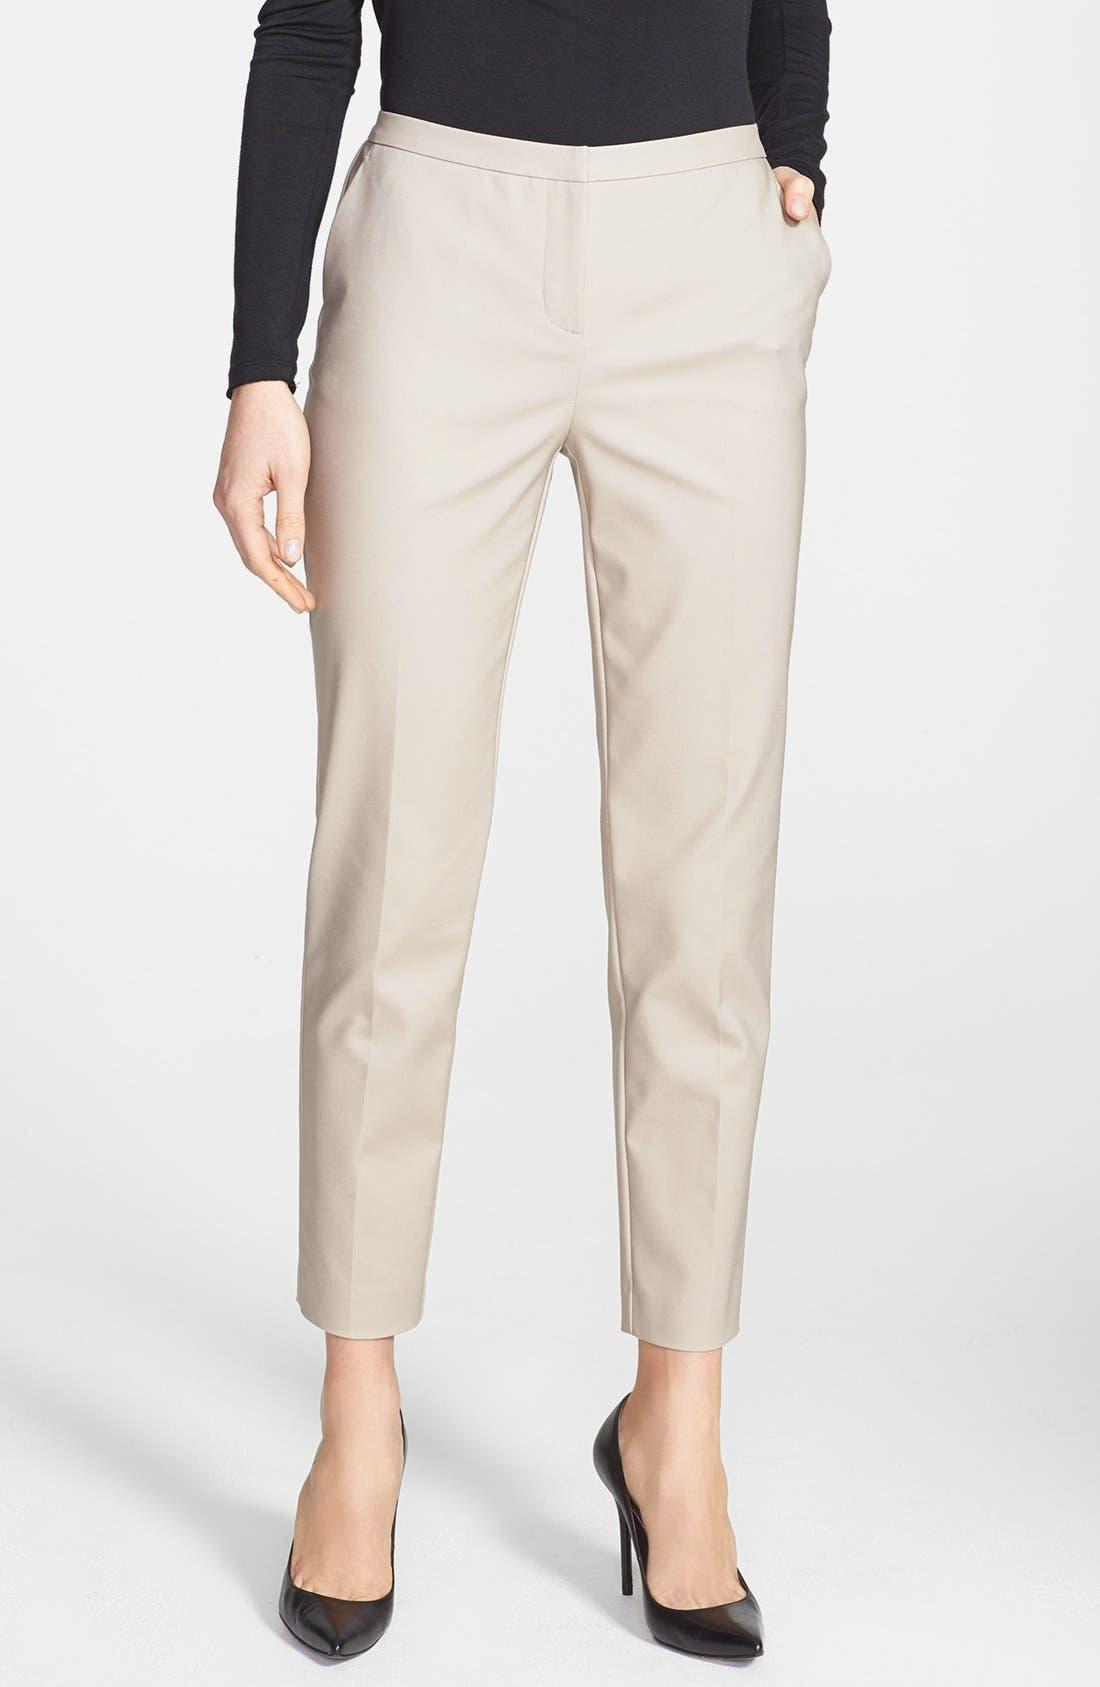 Alternate Image 1 Selected - Halogen® 'Taylor' Stretch Cotton Blend Crop Pants